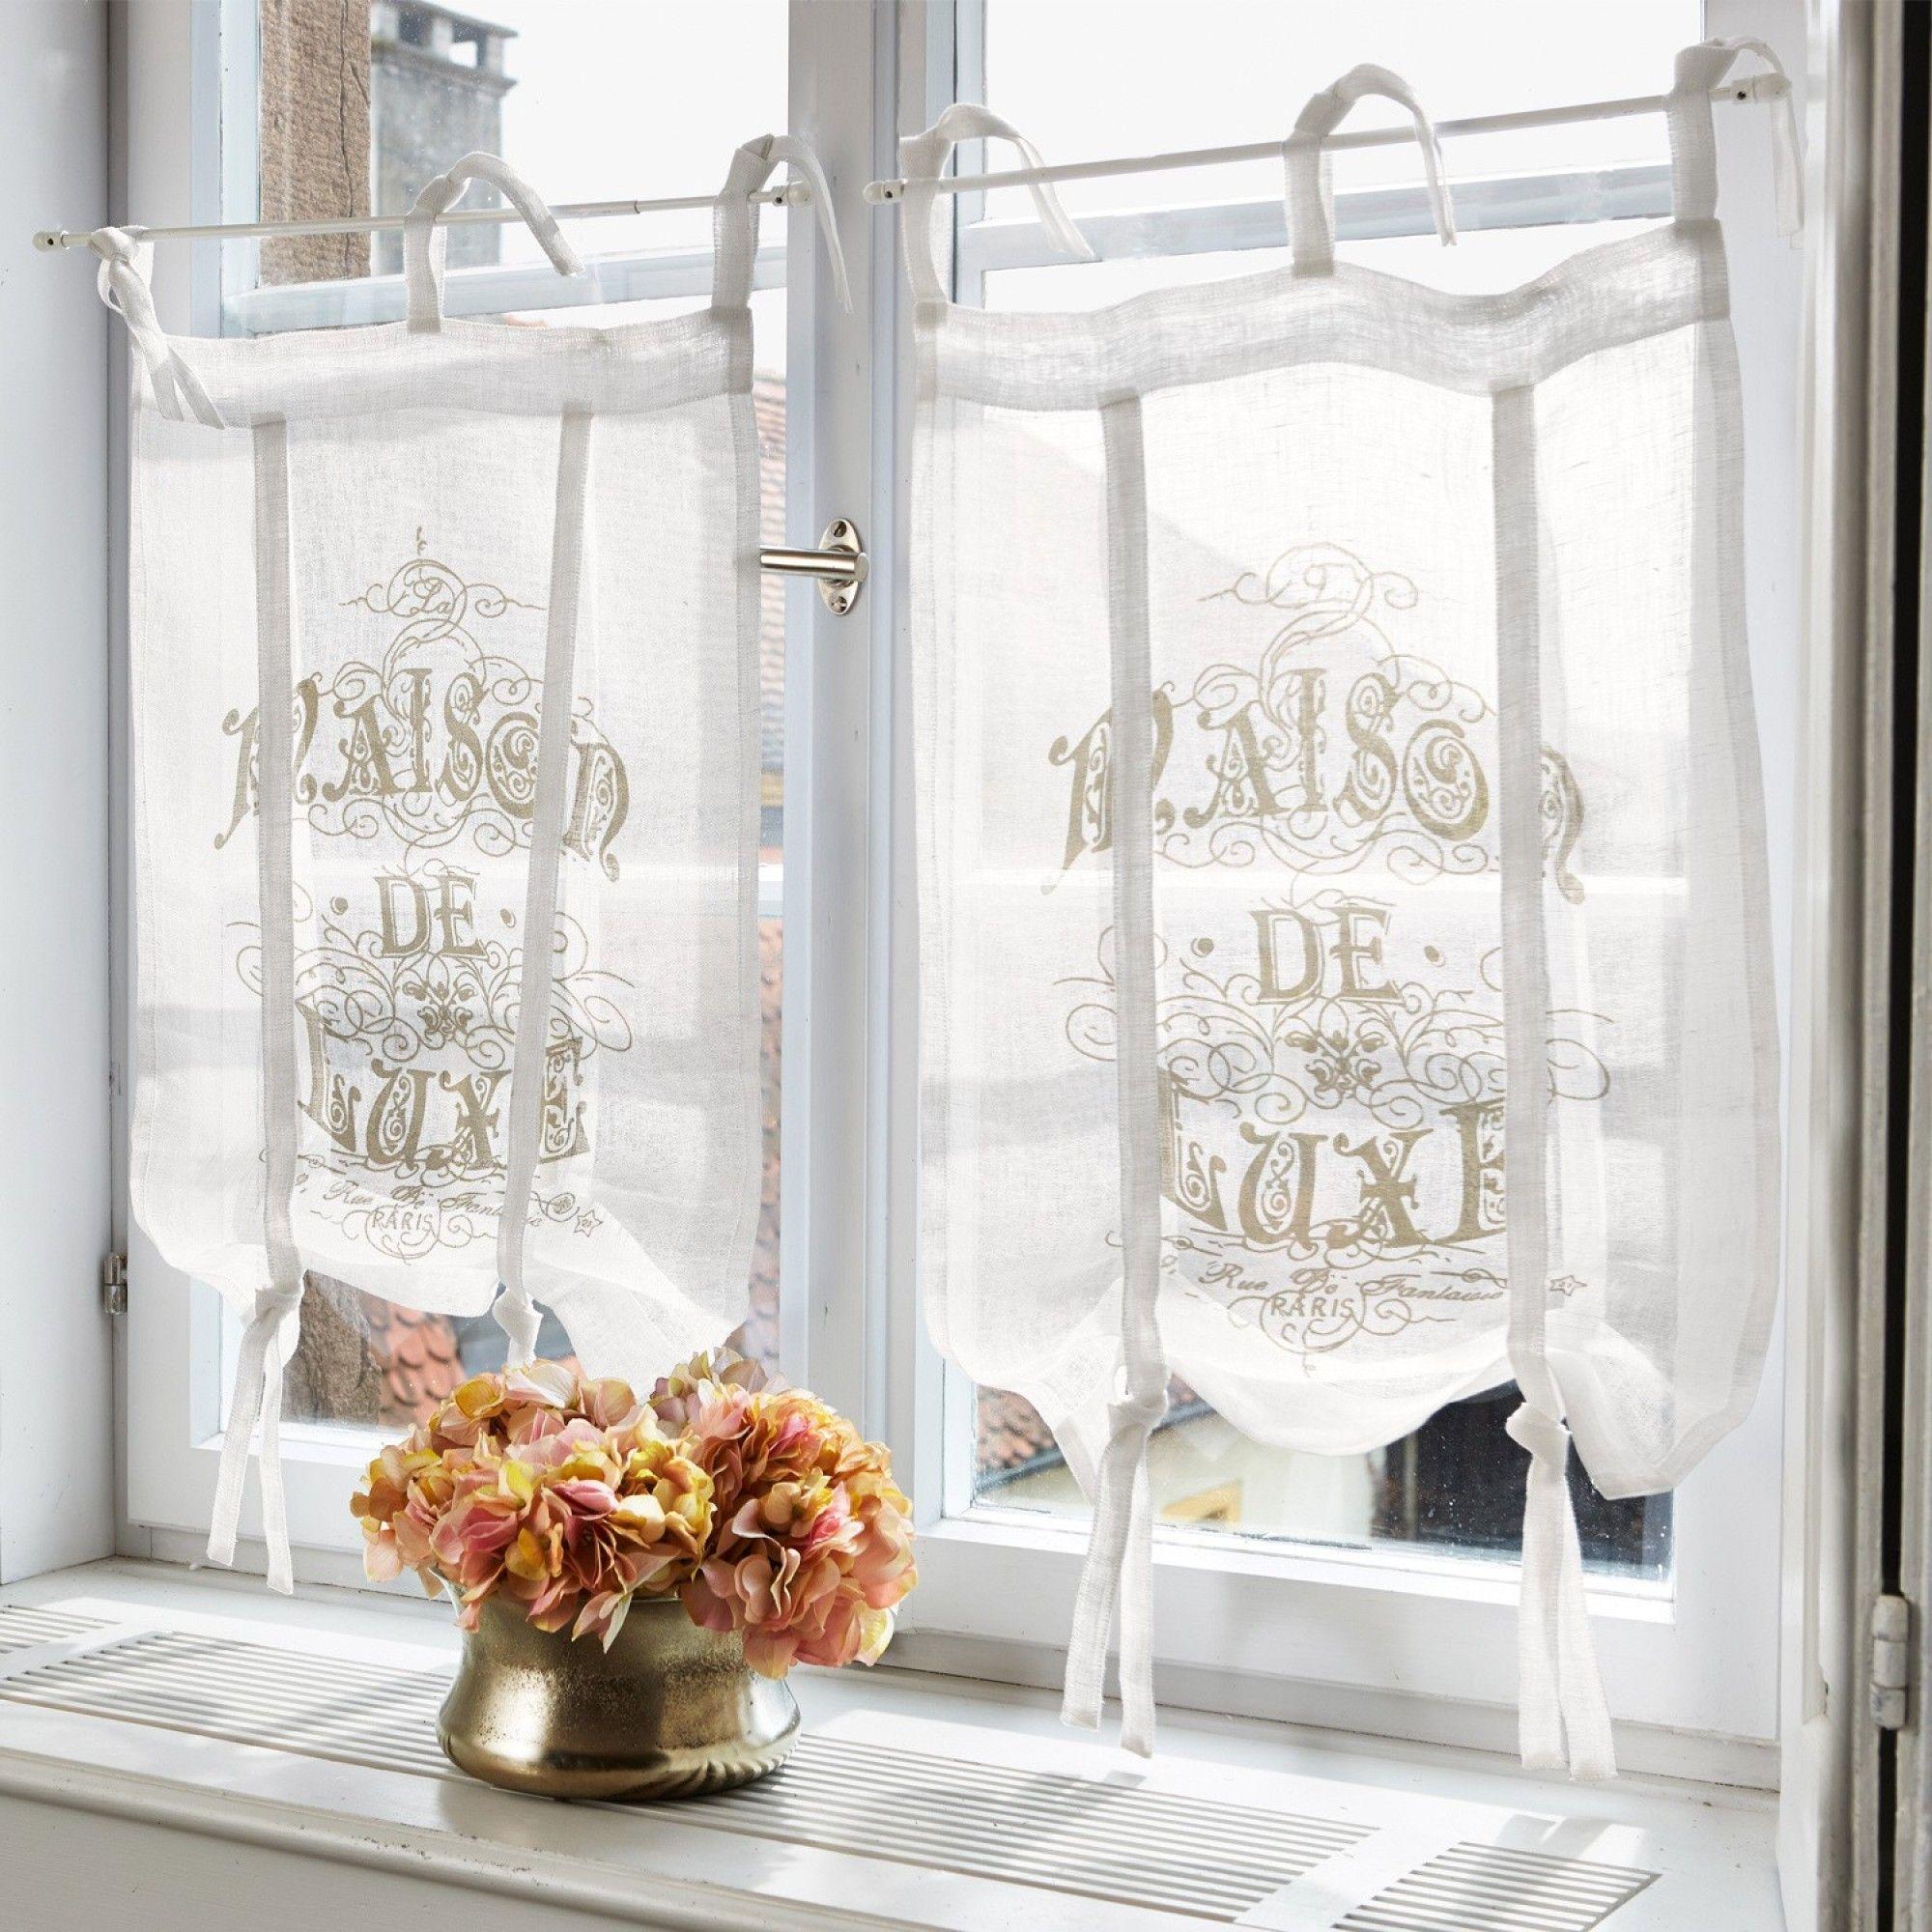 Shabbychic Scheibengardine Luxe In 2020 Shabby Chic Bathroom Home Curtains Curtains